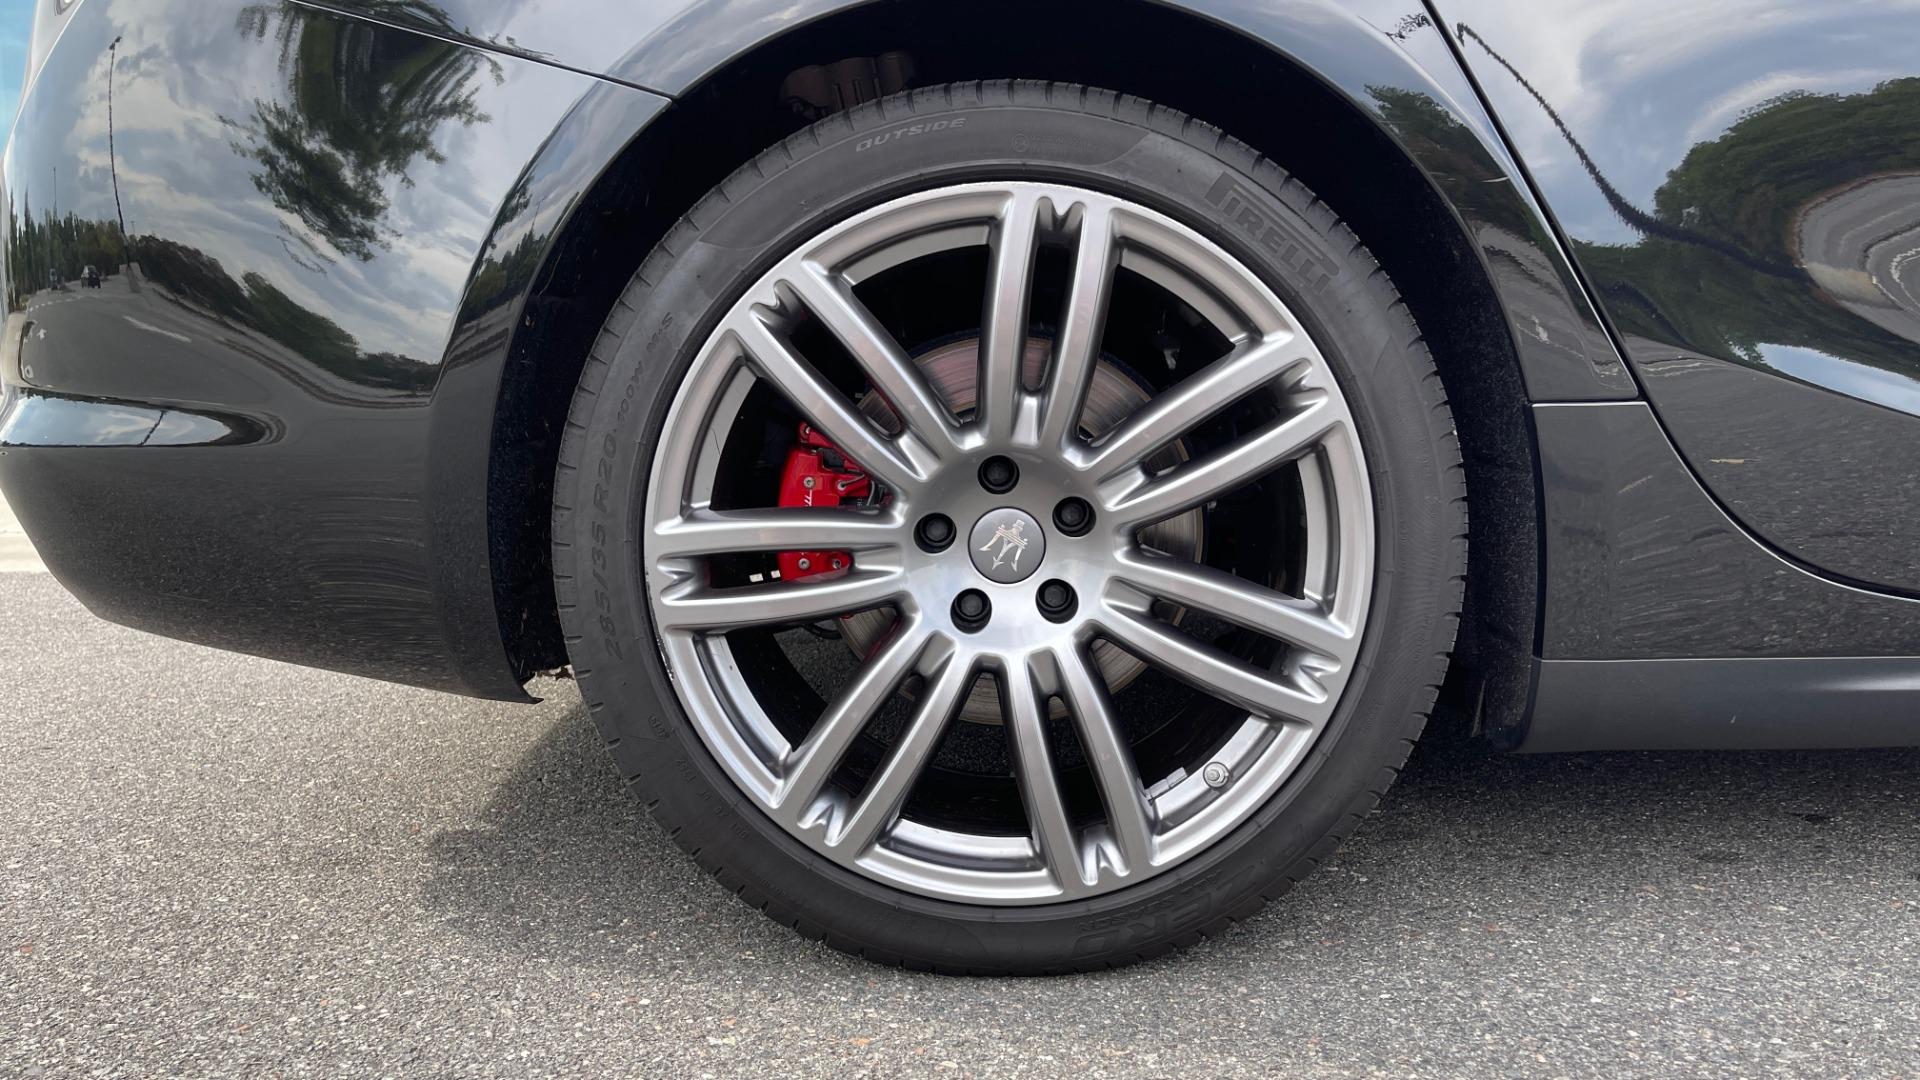 Used 2018 Maserati GHIBLI 3.0L SEDAN / 8-SPD AUTO / NAV / SUNROOF / REARVIEW for sale $42,995 at Formula Imports in Charlotte NC 28227 64